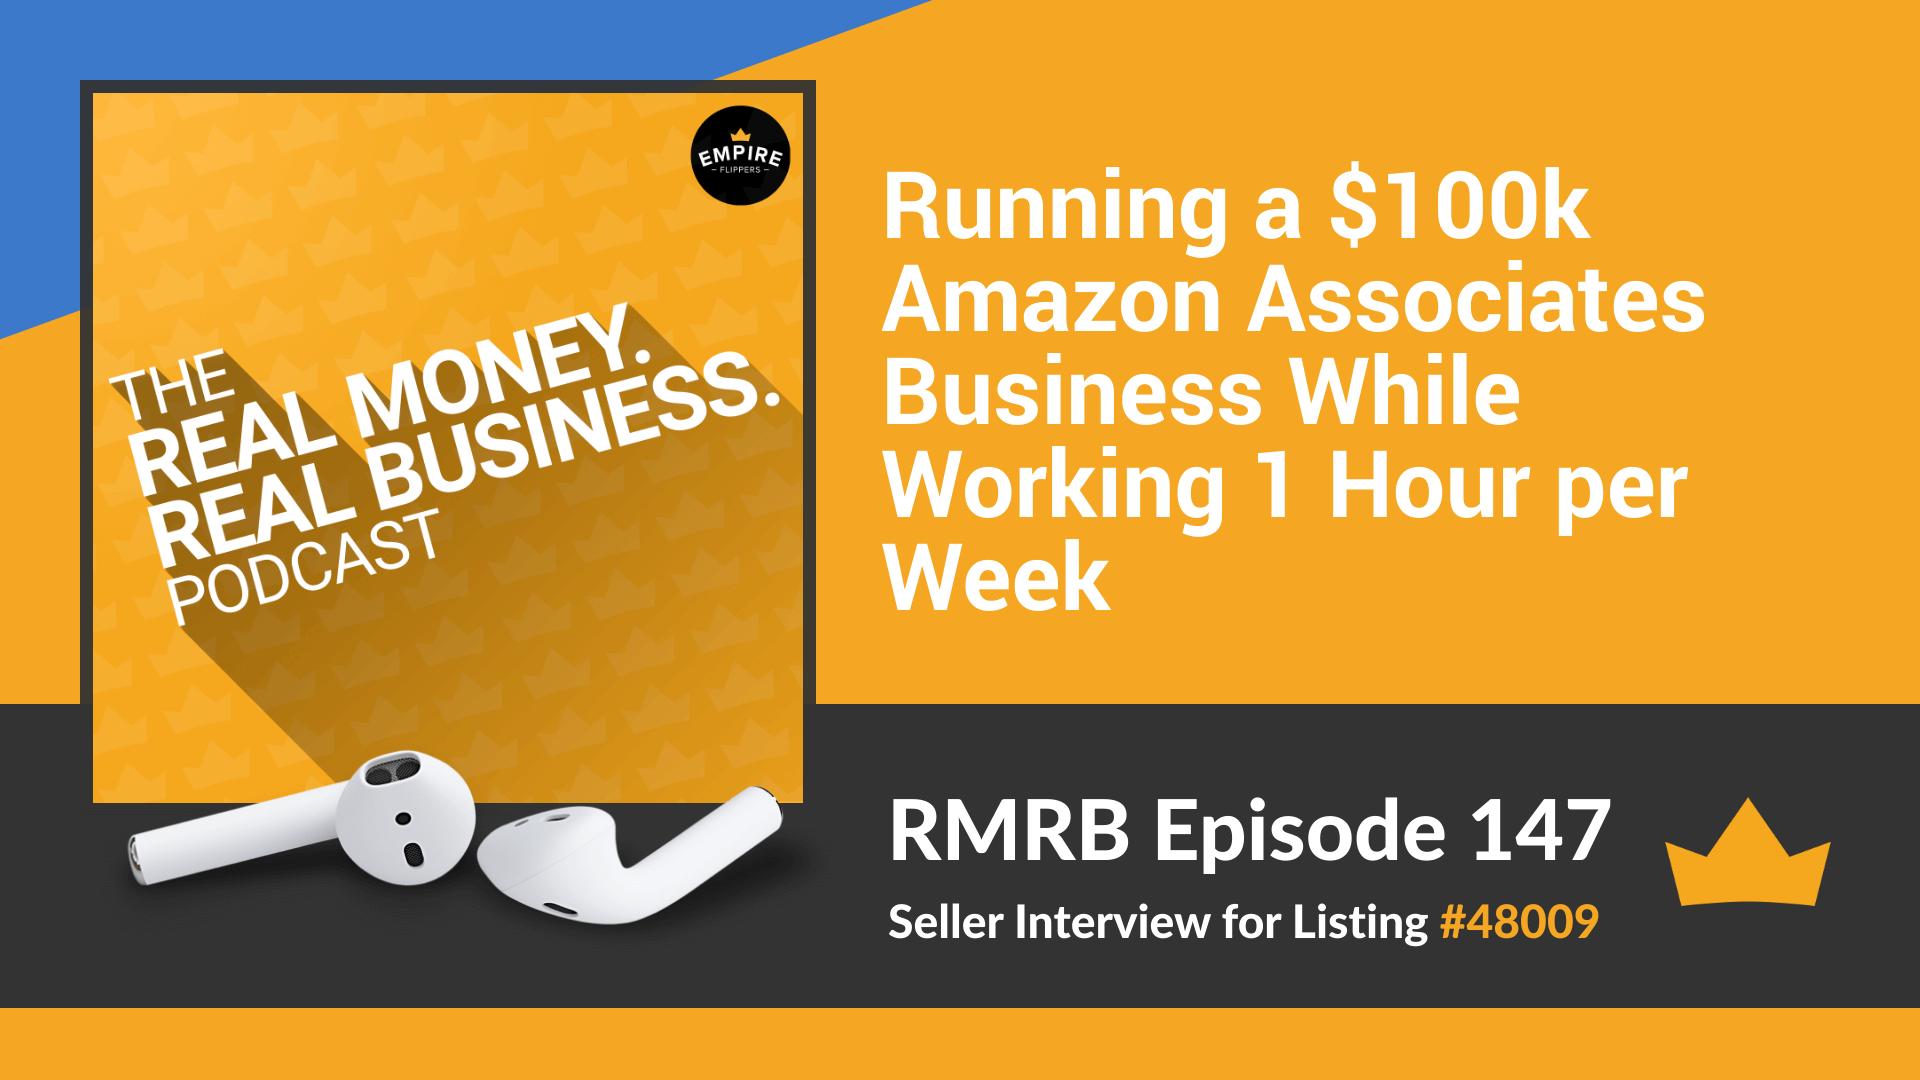 RMRB 147 - Running a $100k Amazon Associates Business While Working 1 Hour per Week